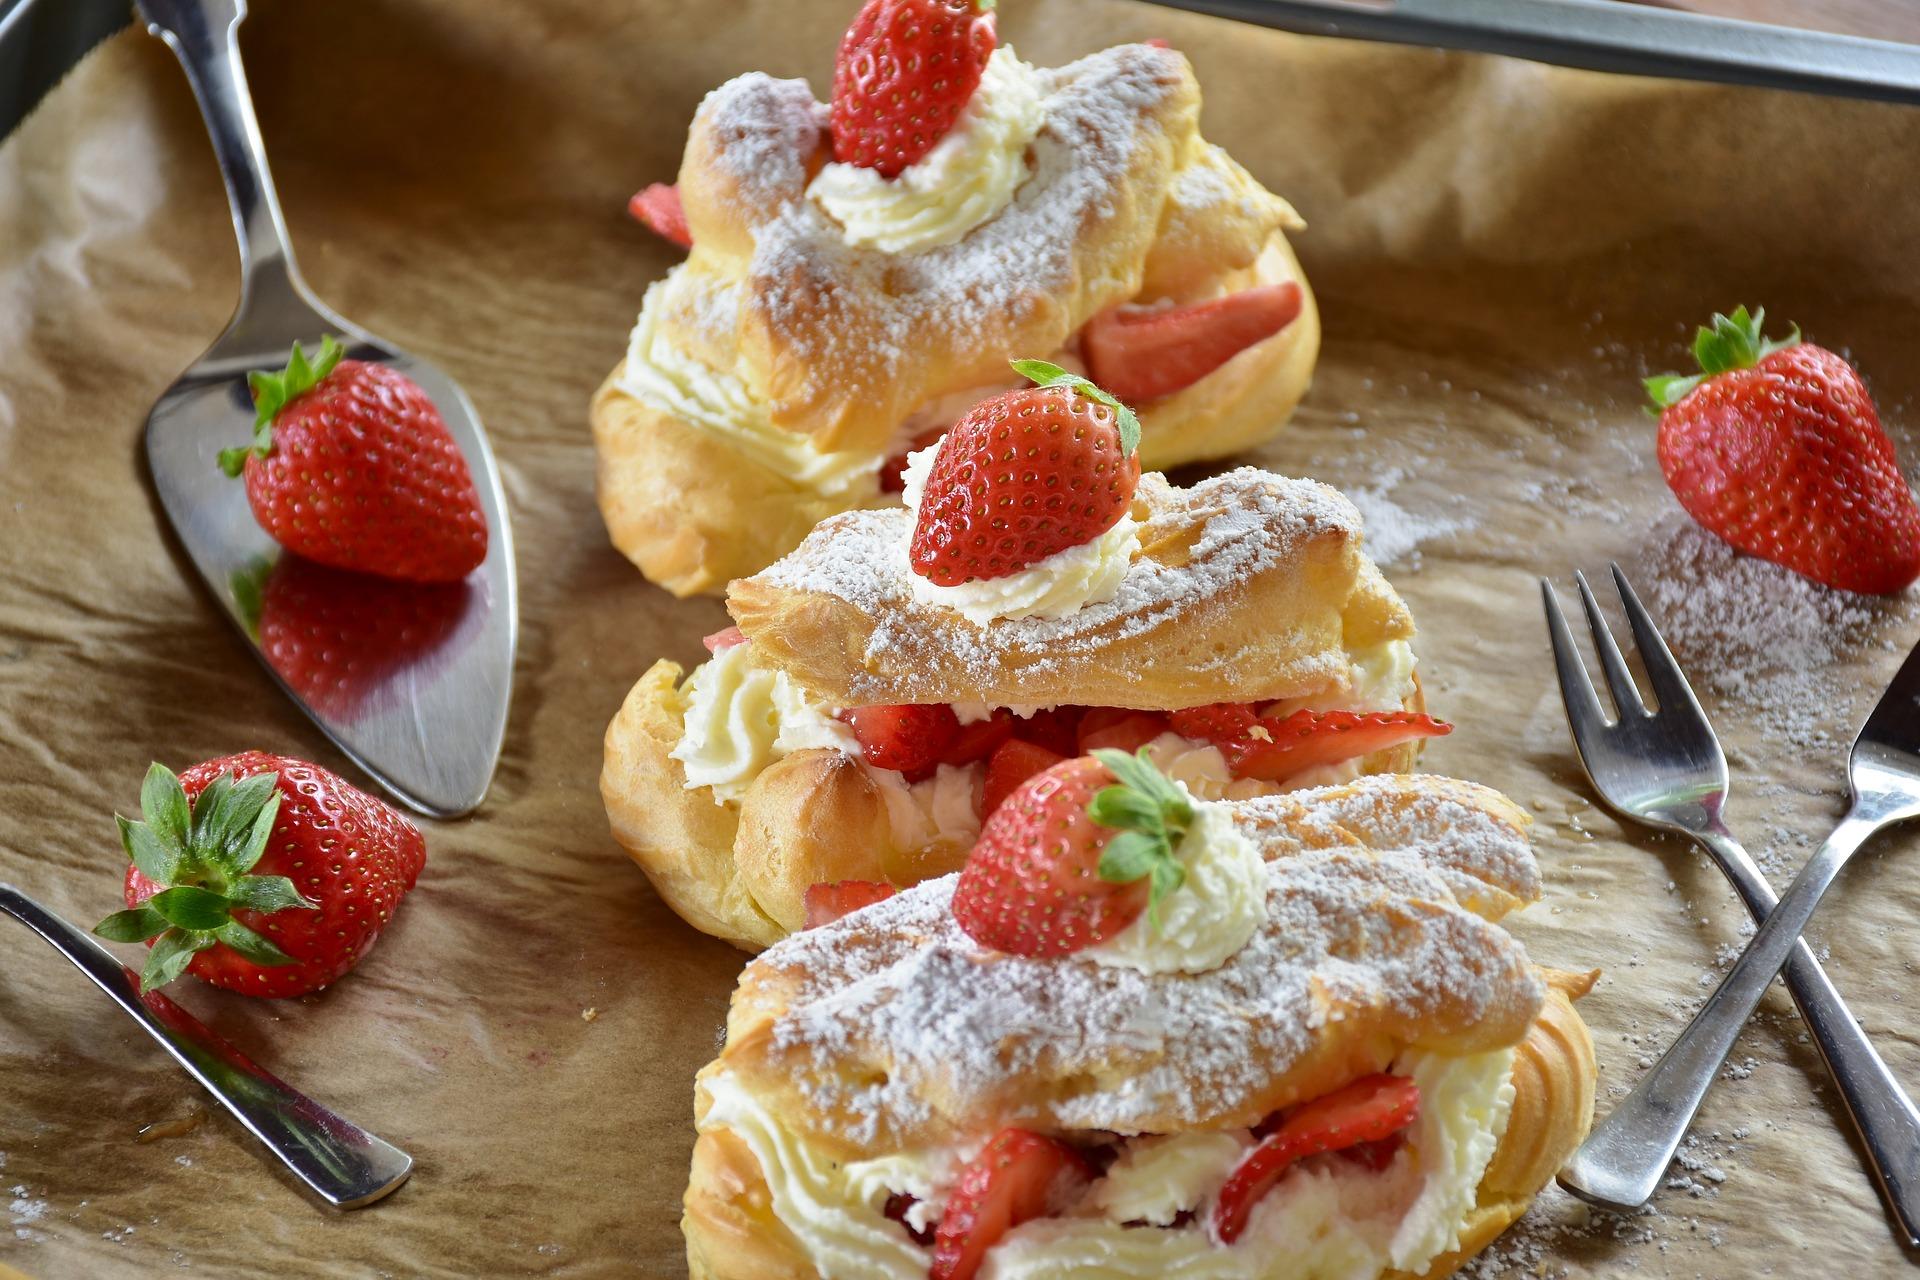 Idée Repas Entre Amis Marmiton Quel dessert pour votre repas entre amis ?   Le Marmiton